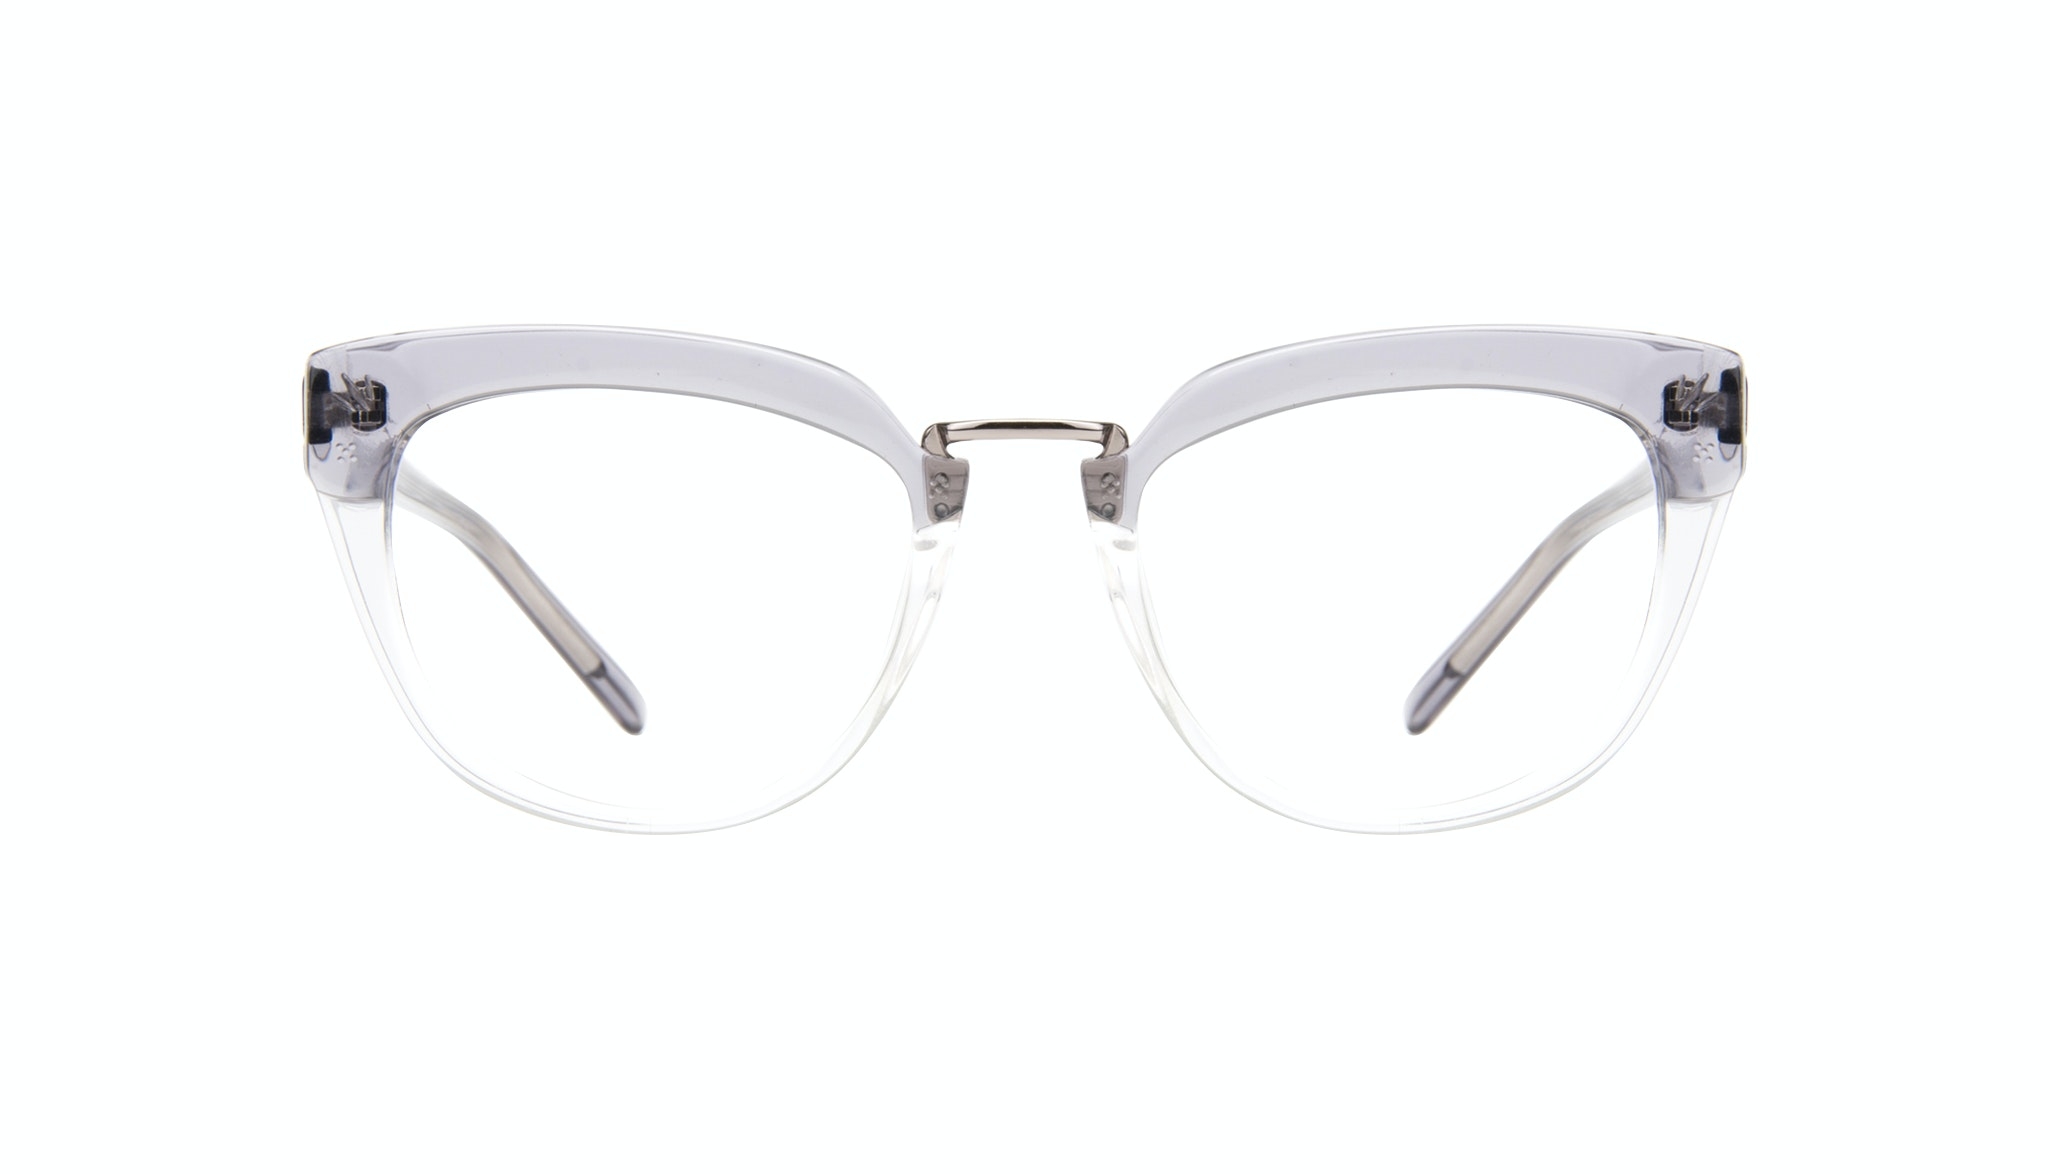 Affordable Fashion Glasses Cat Eye Daring Cateye Eyeglasses Women Pure Grey Front